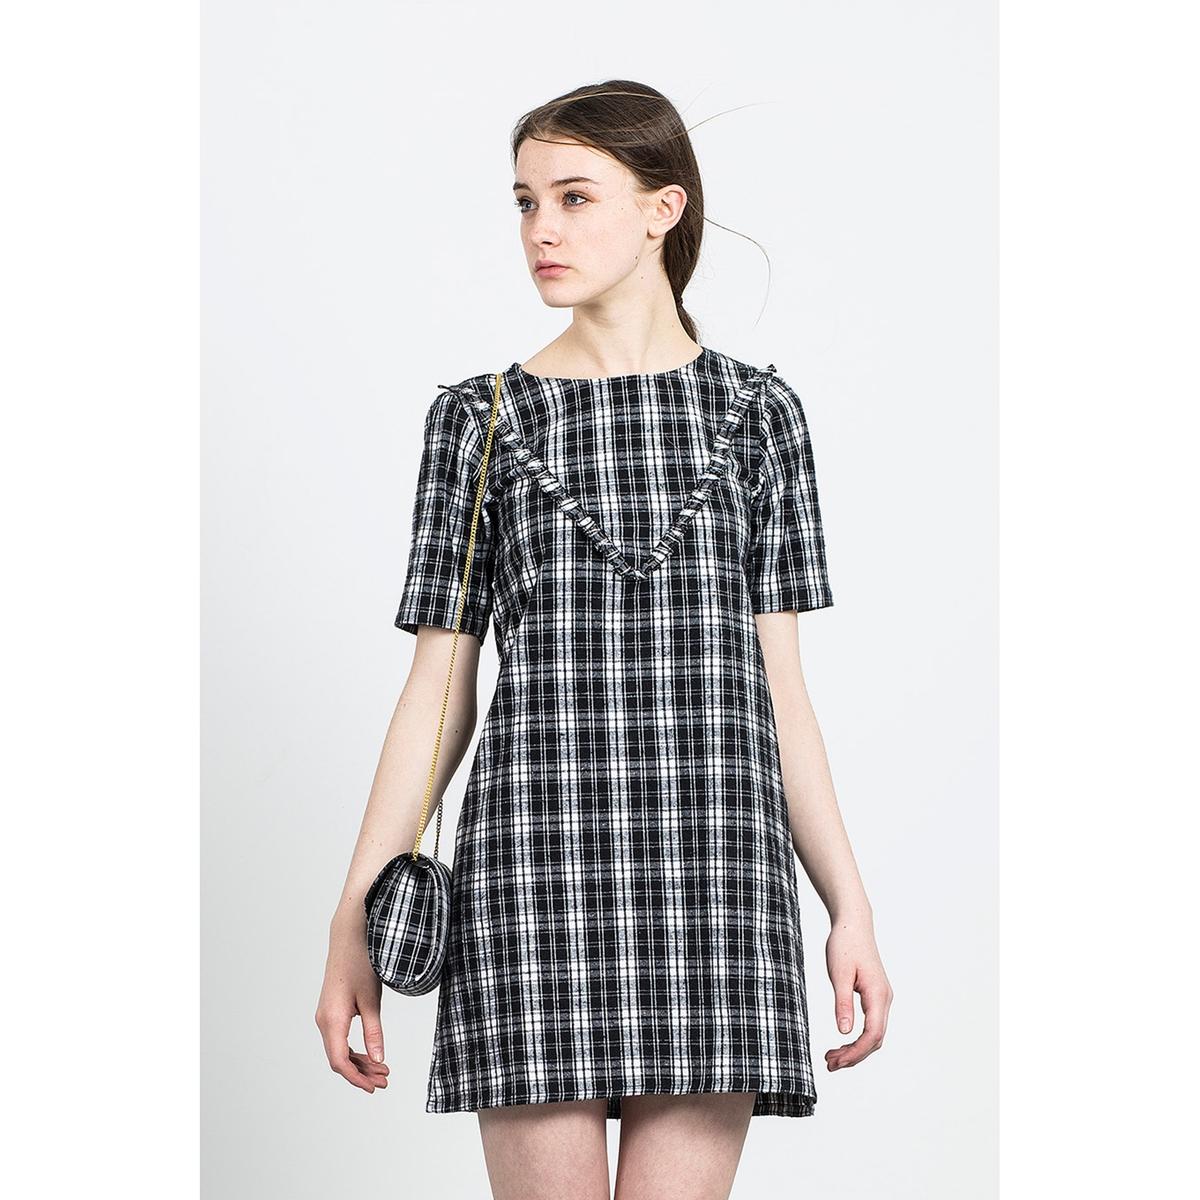 Vestido curto, BINGO DRESS